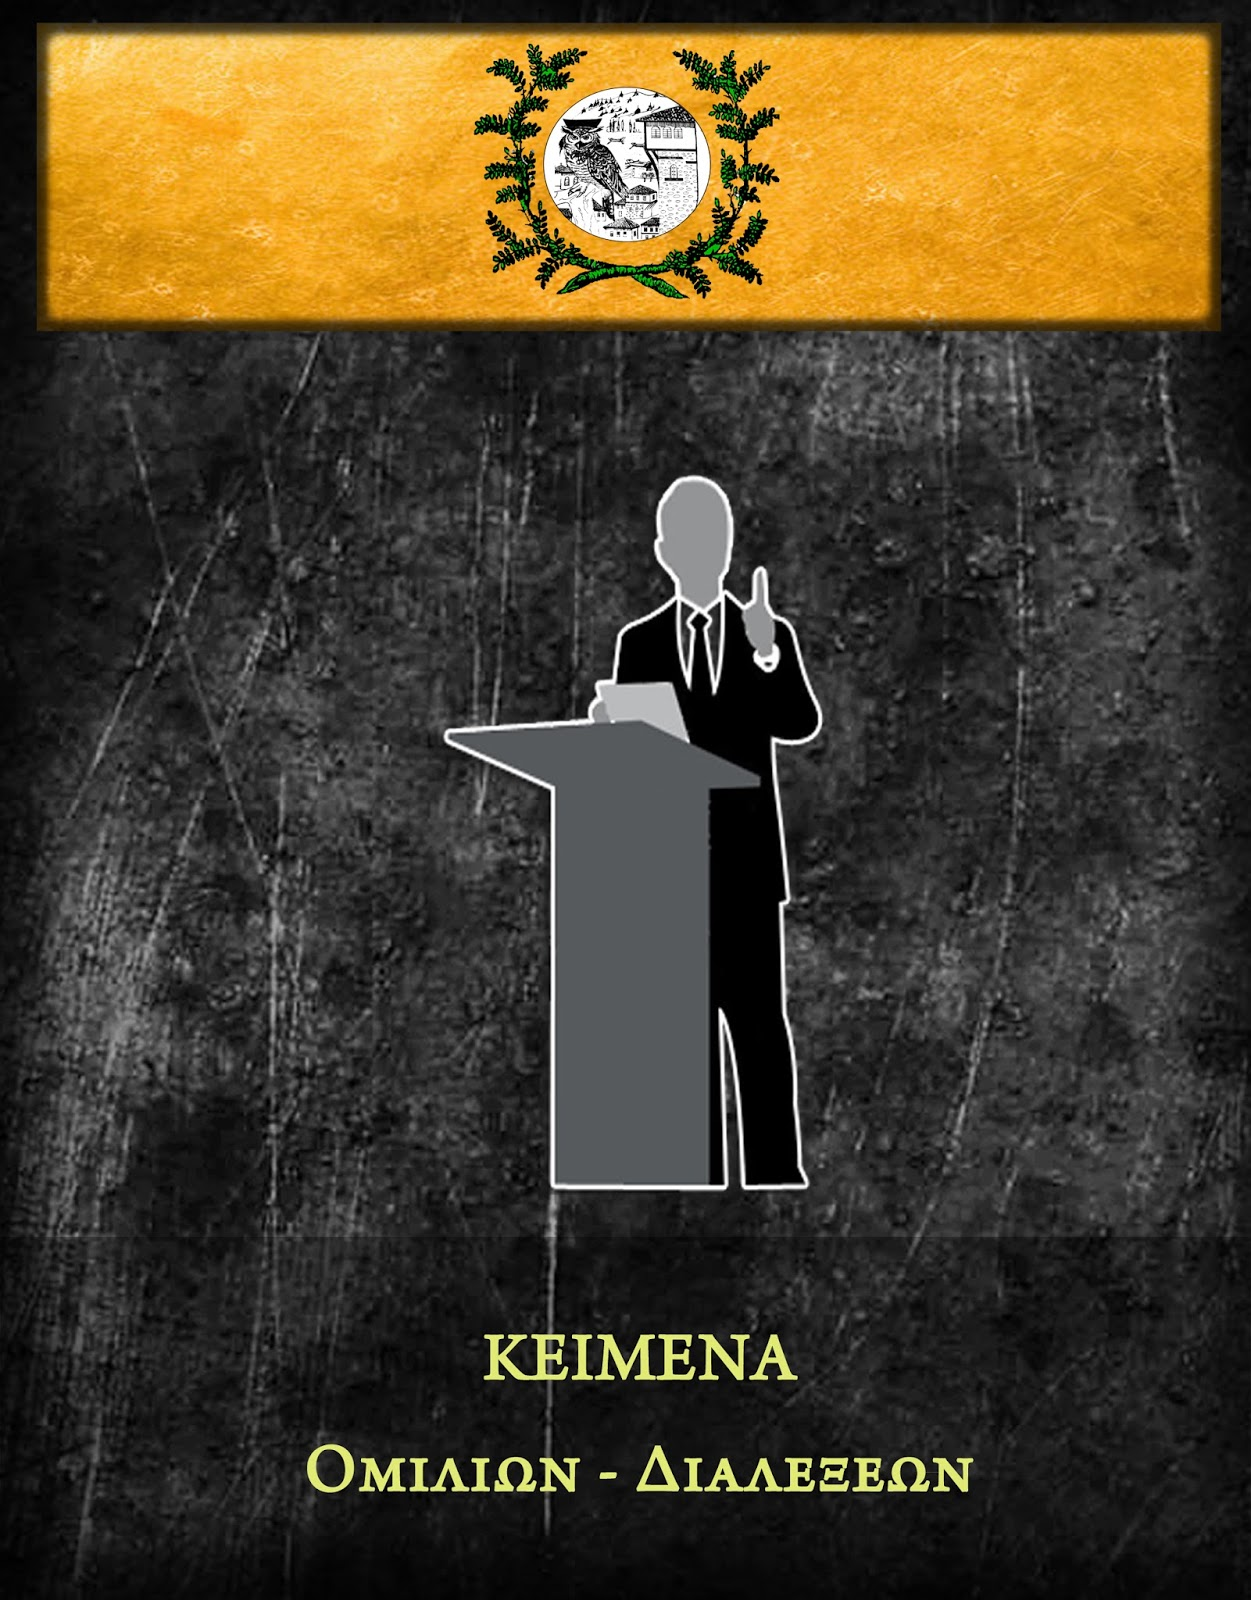 http://mandakasis-academy.blogspot.gr/p/keimena.html